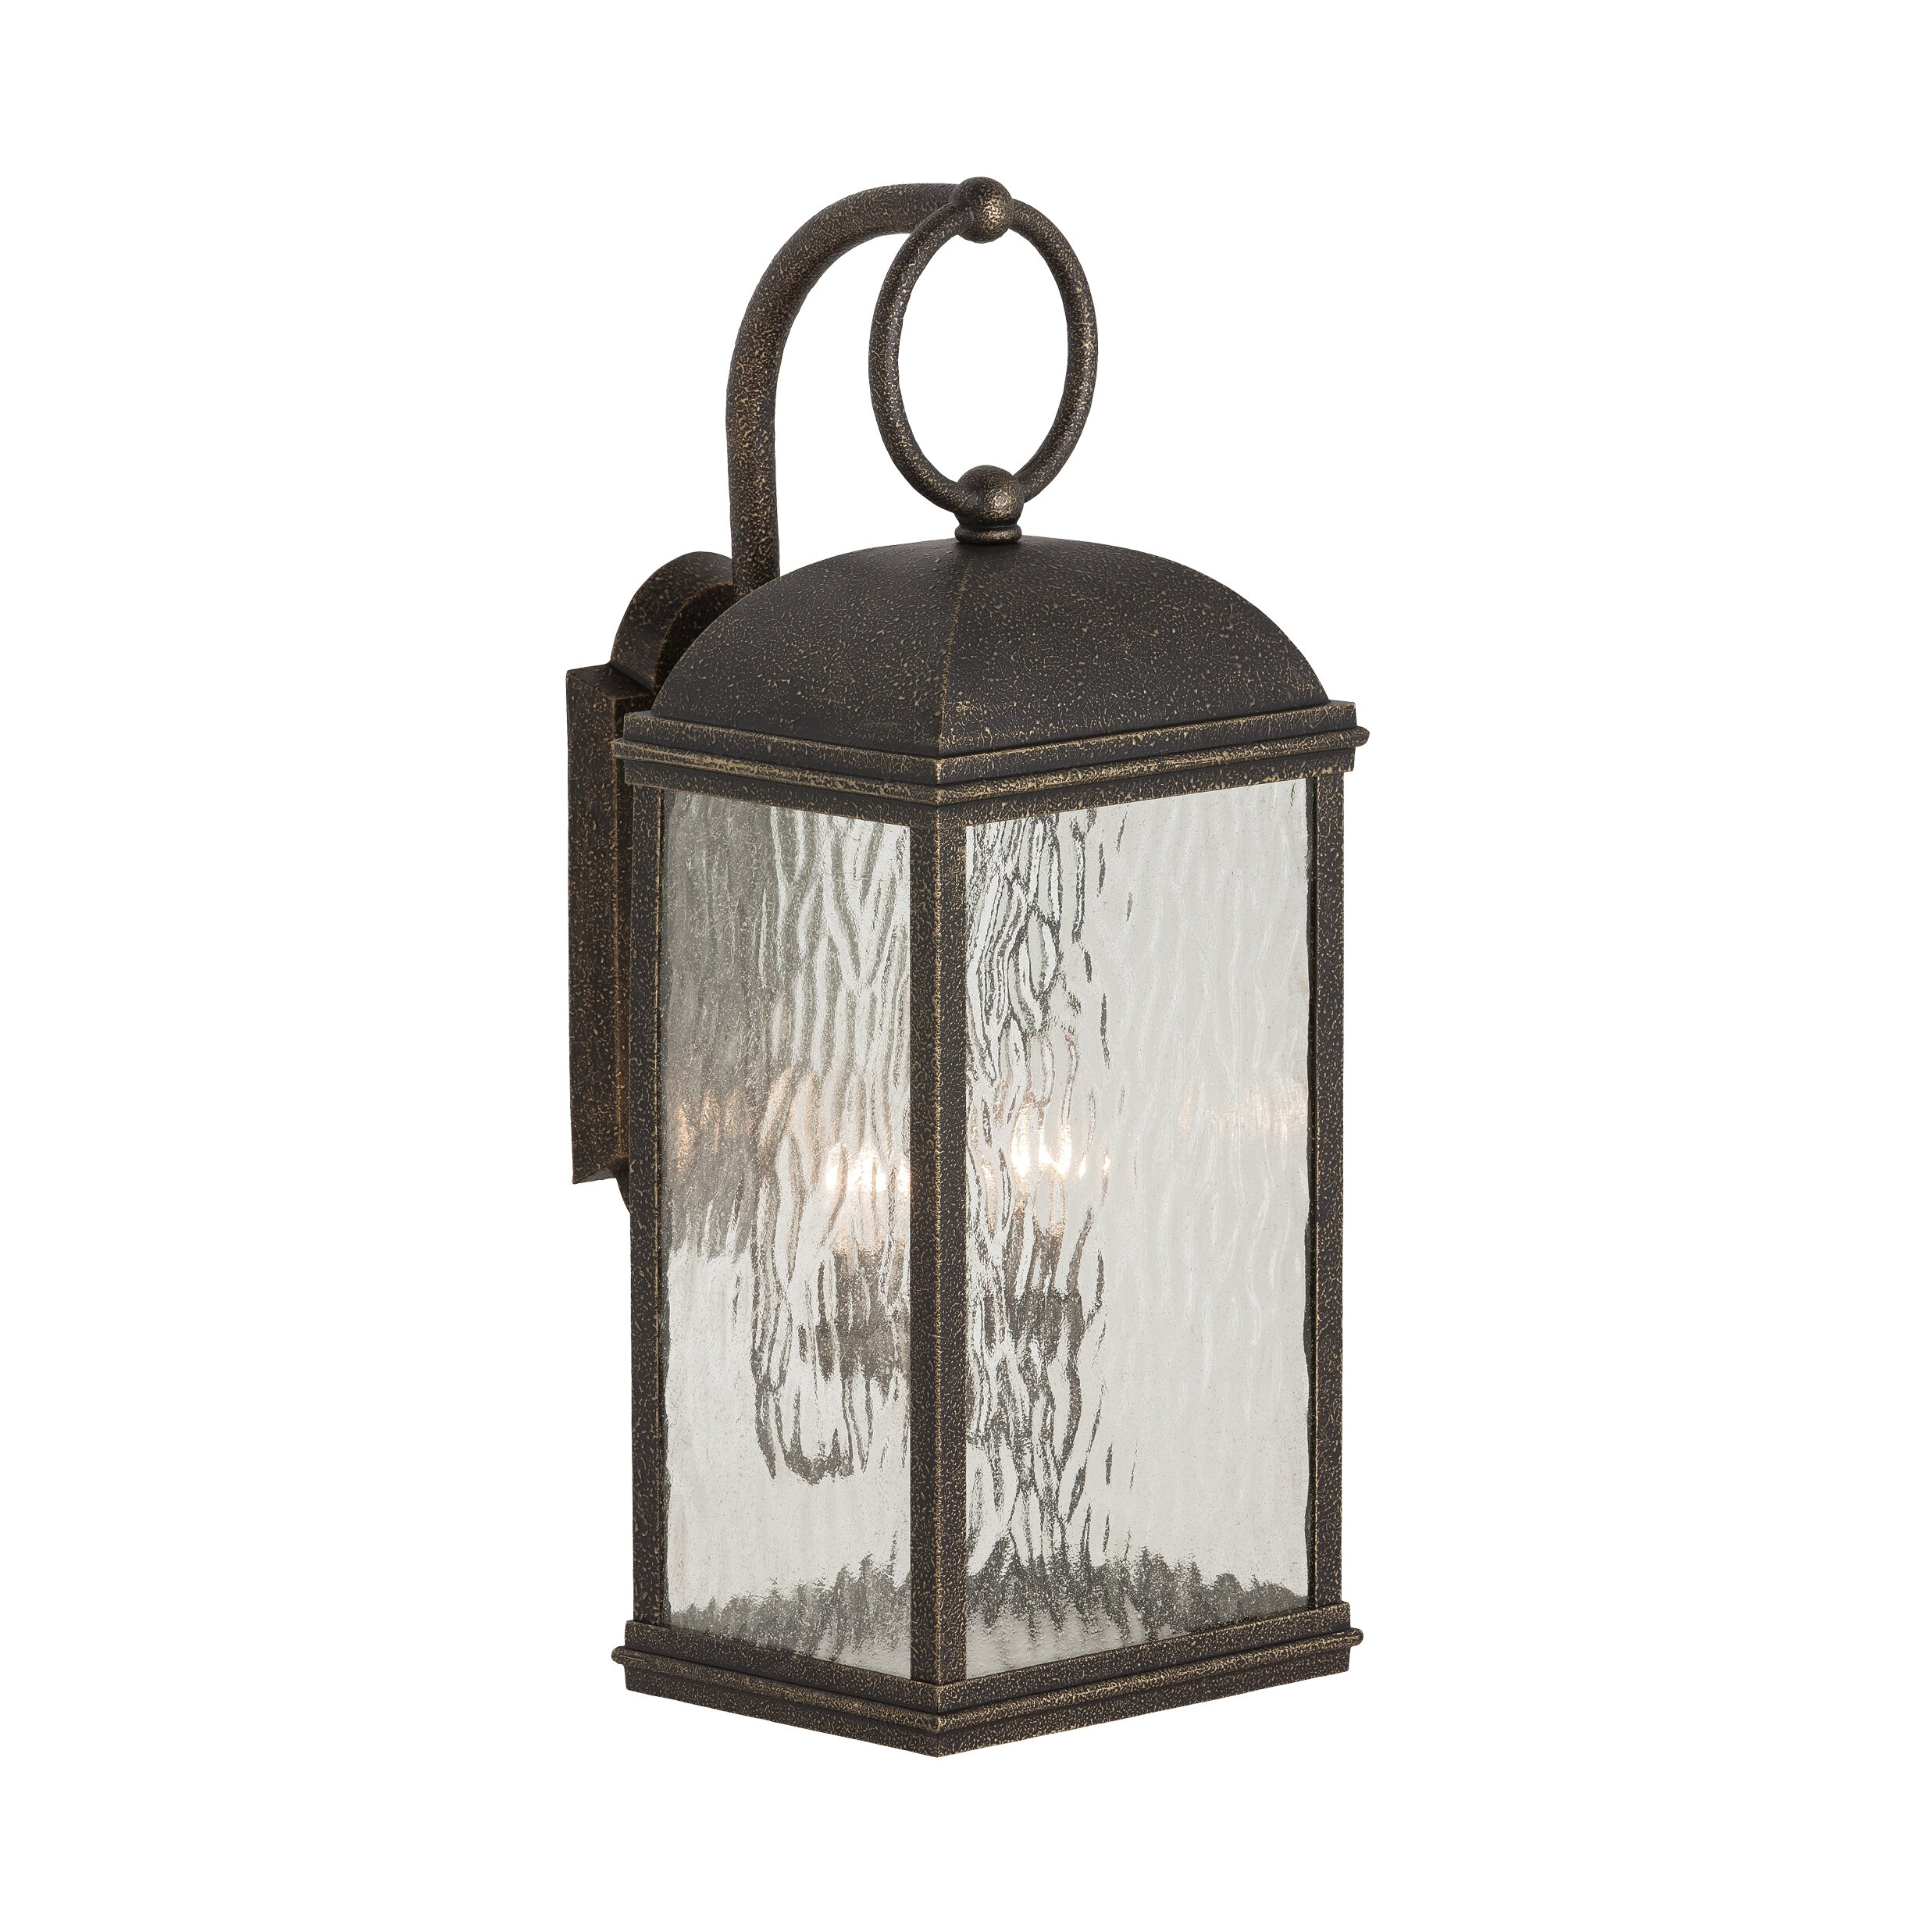 Sea Gull Lighting Branford 2 Light Outdoor Wall Lantern